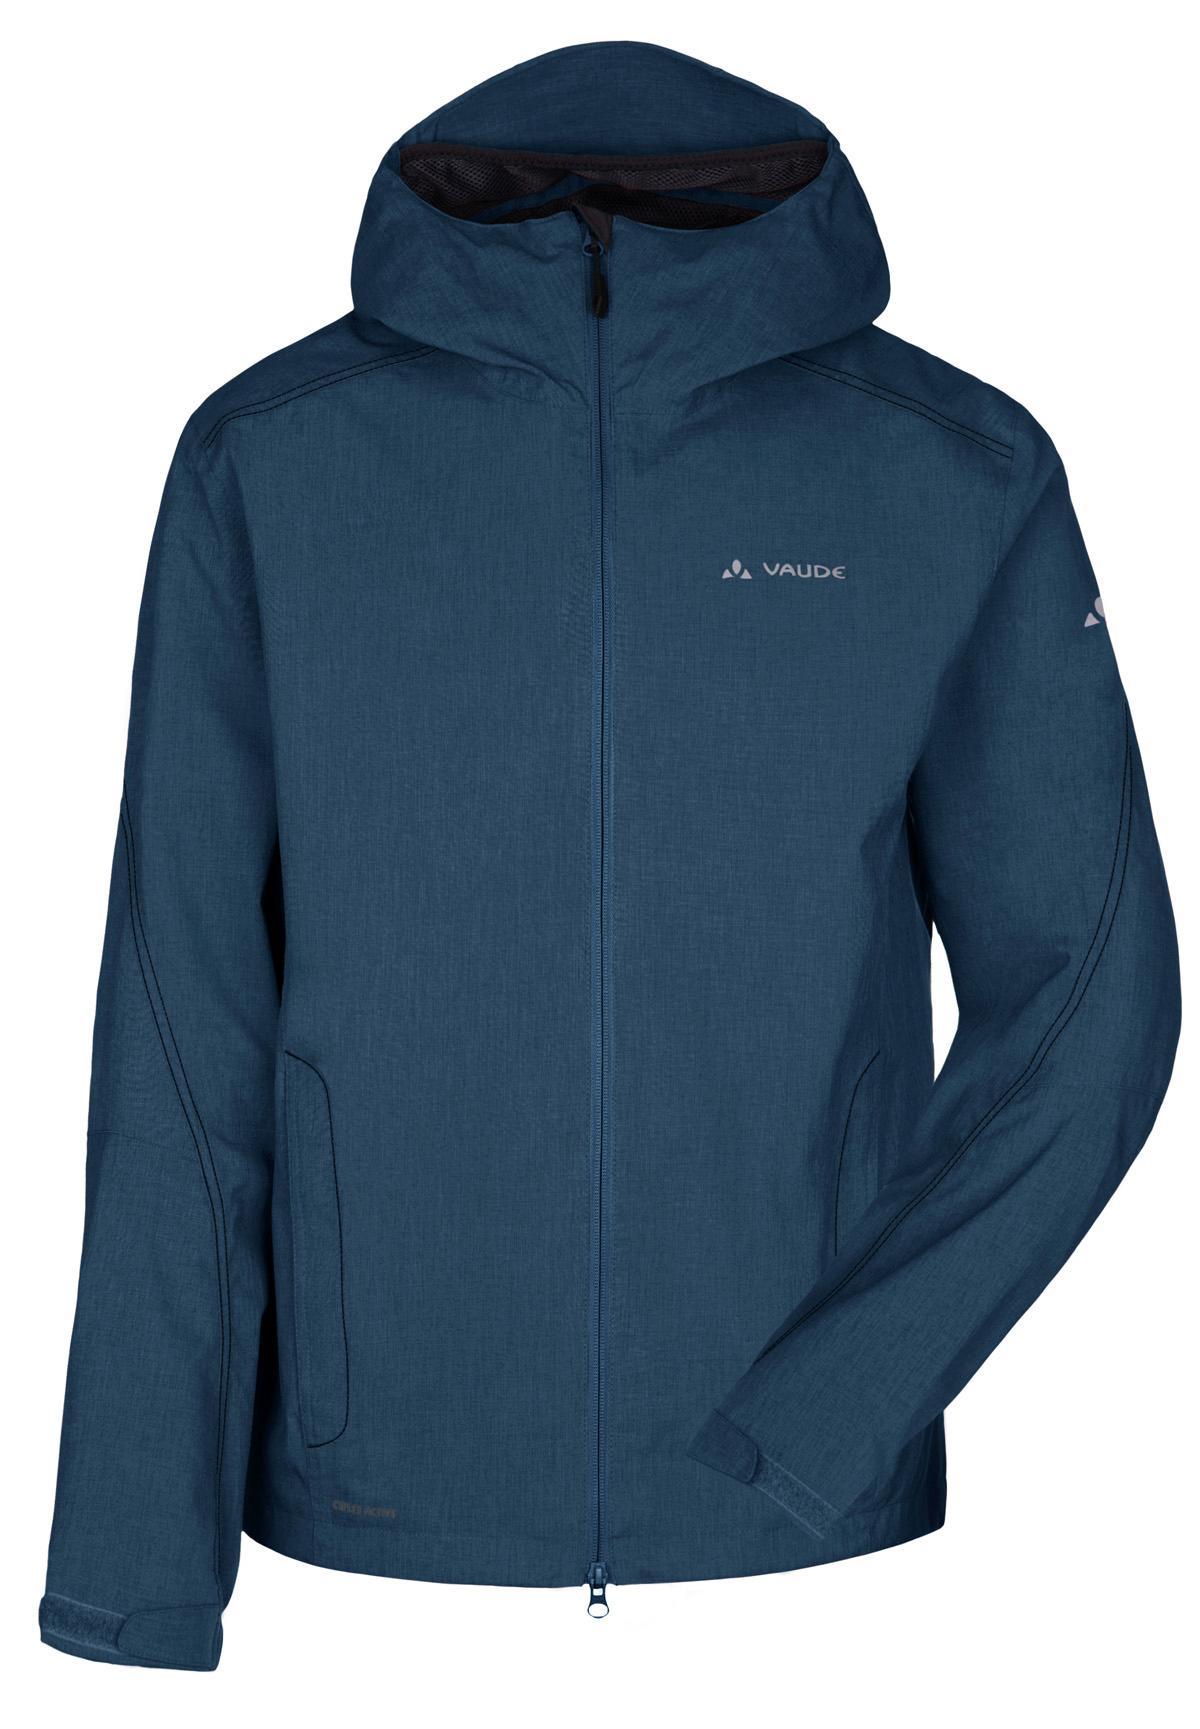 VAUDE Herren Jacke Men's Estero Jacket Blue Whale Größe M 40,72€  @Amazon